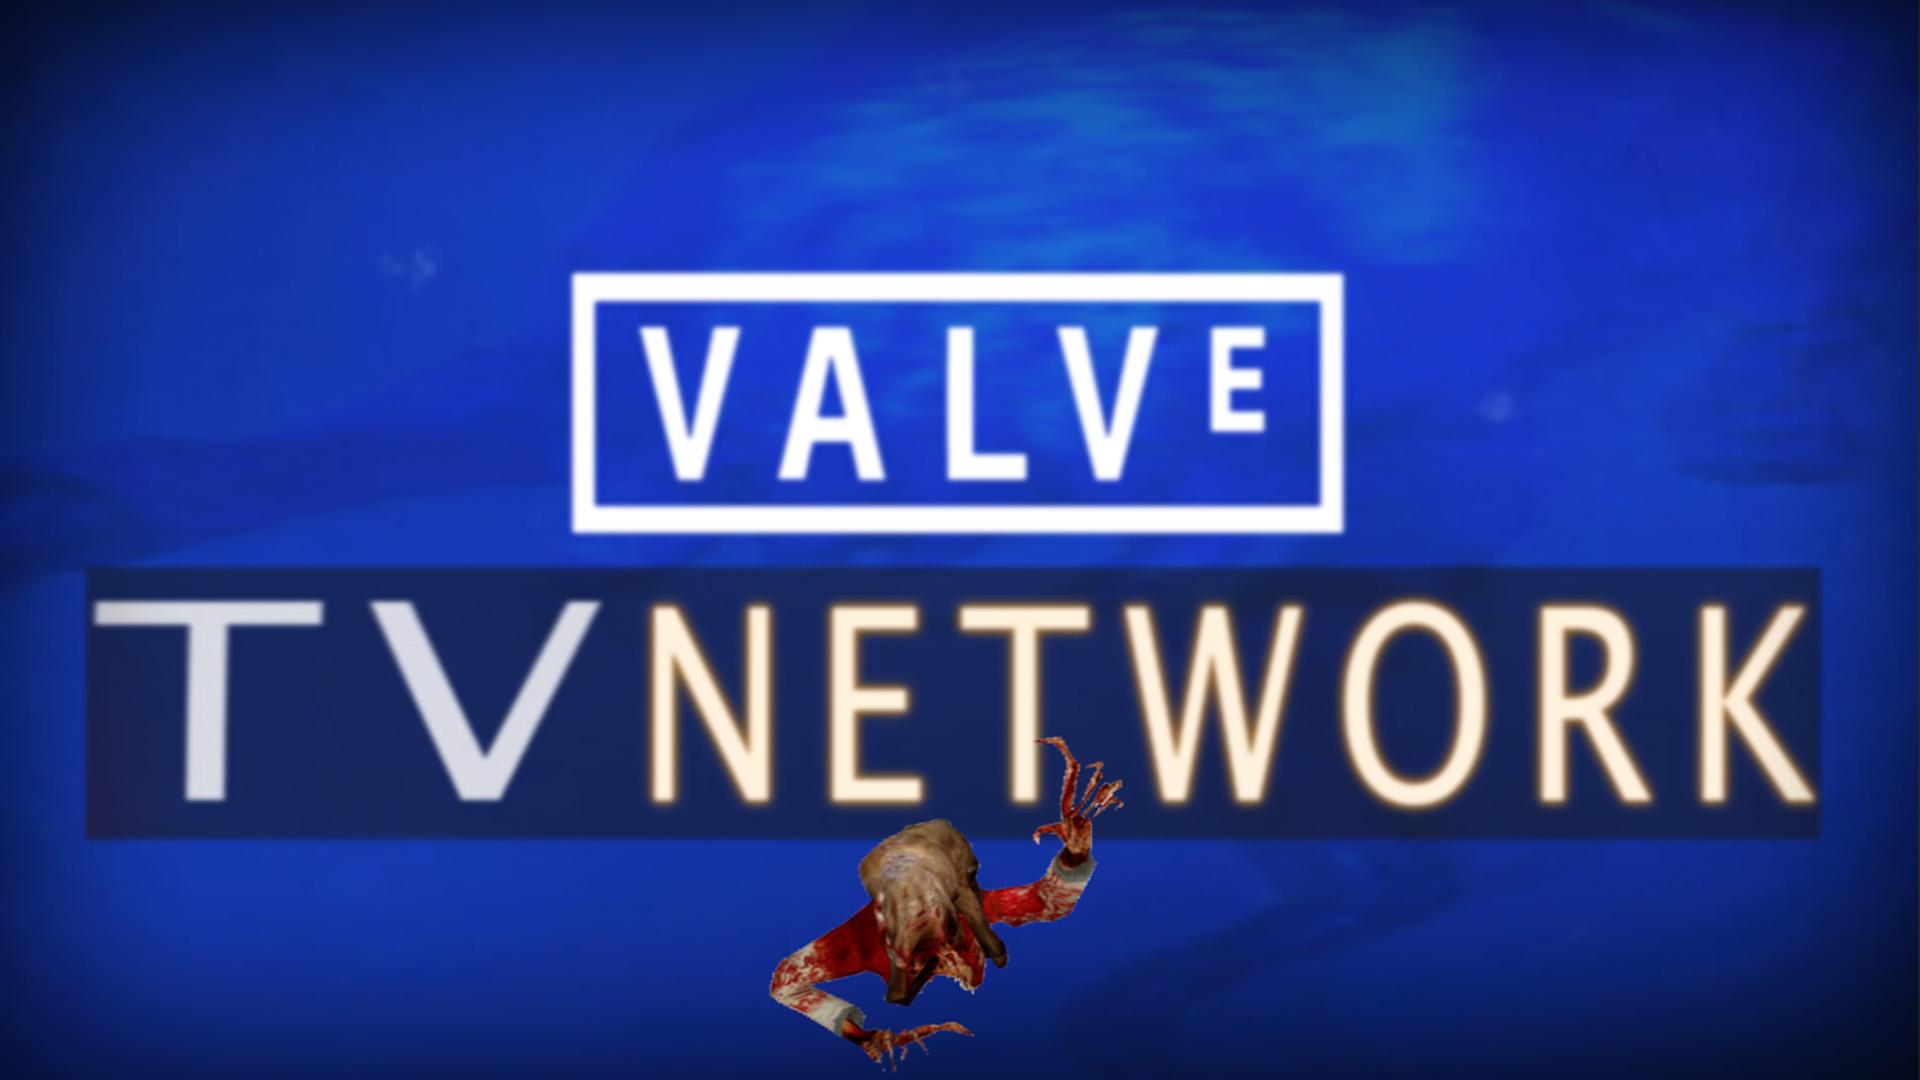 Valve TV Network